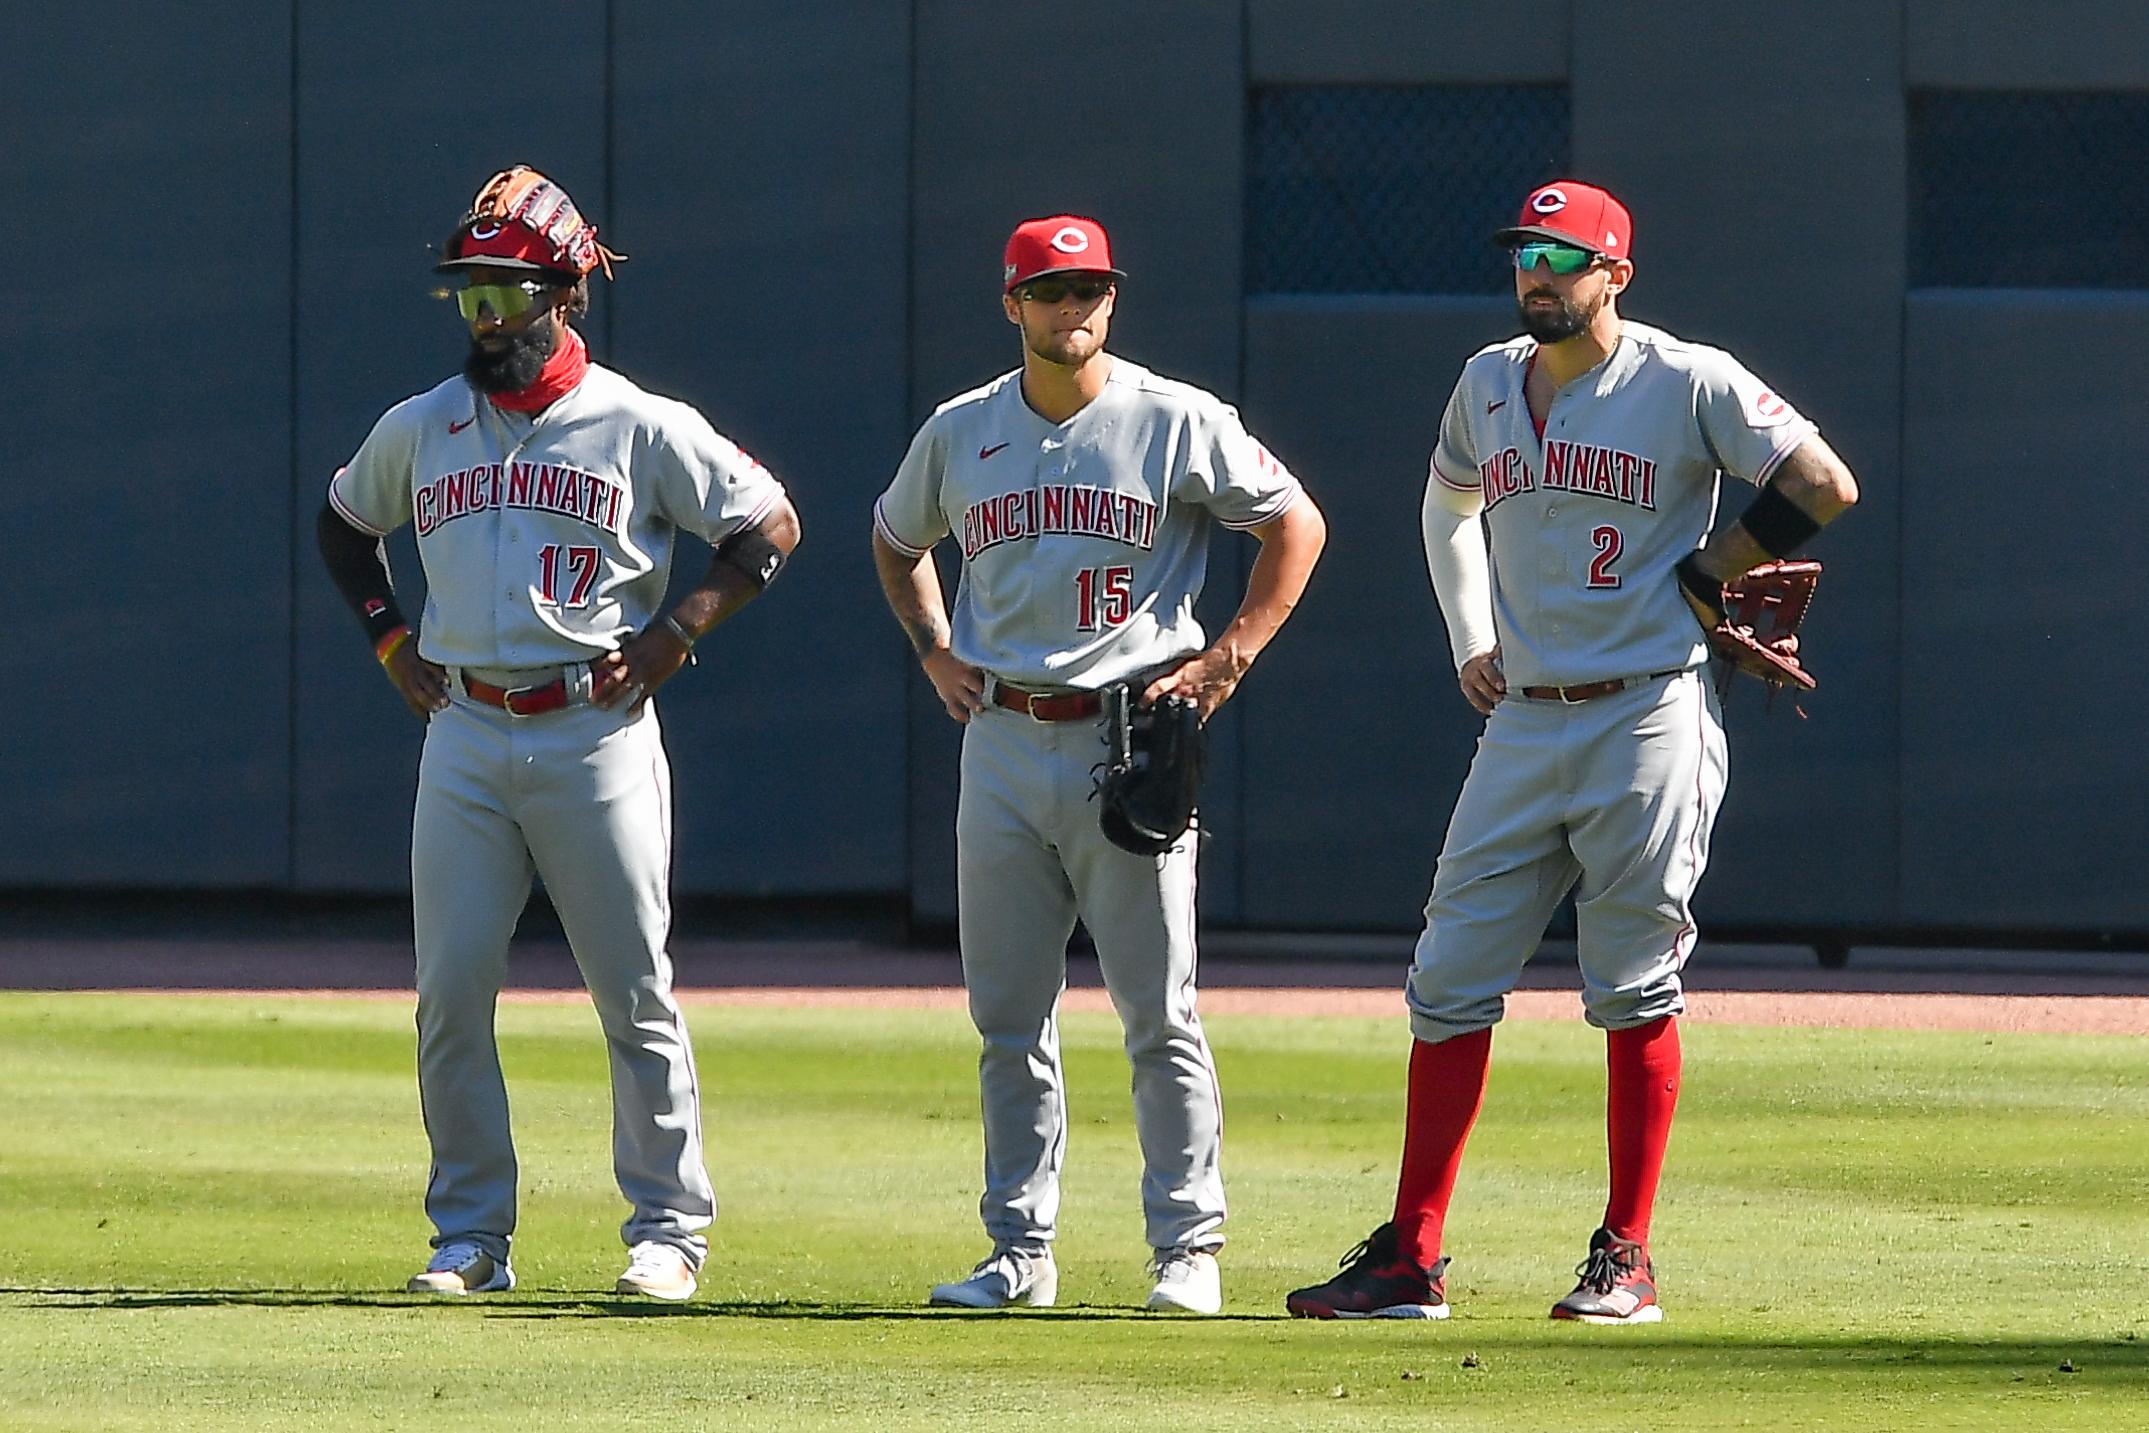 MLB: OCT 01 NL Wild Card Series - Reds at Braves